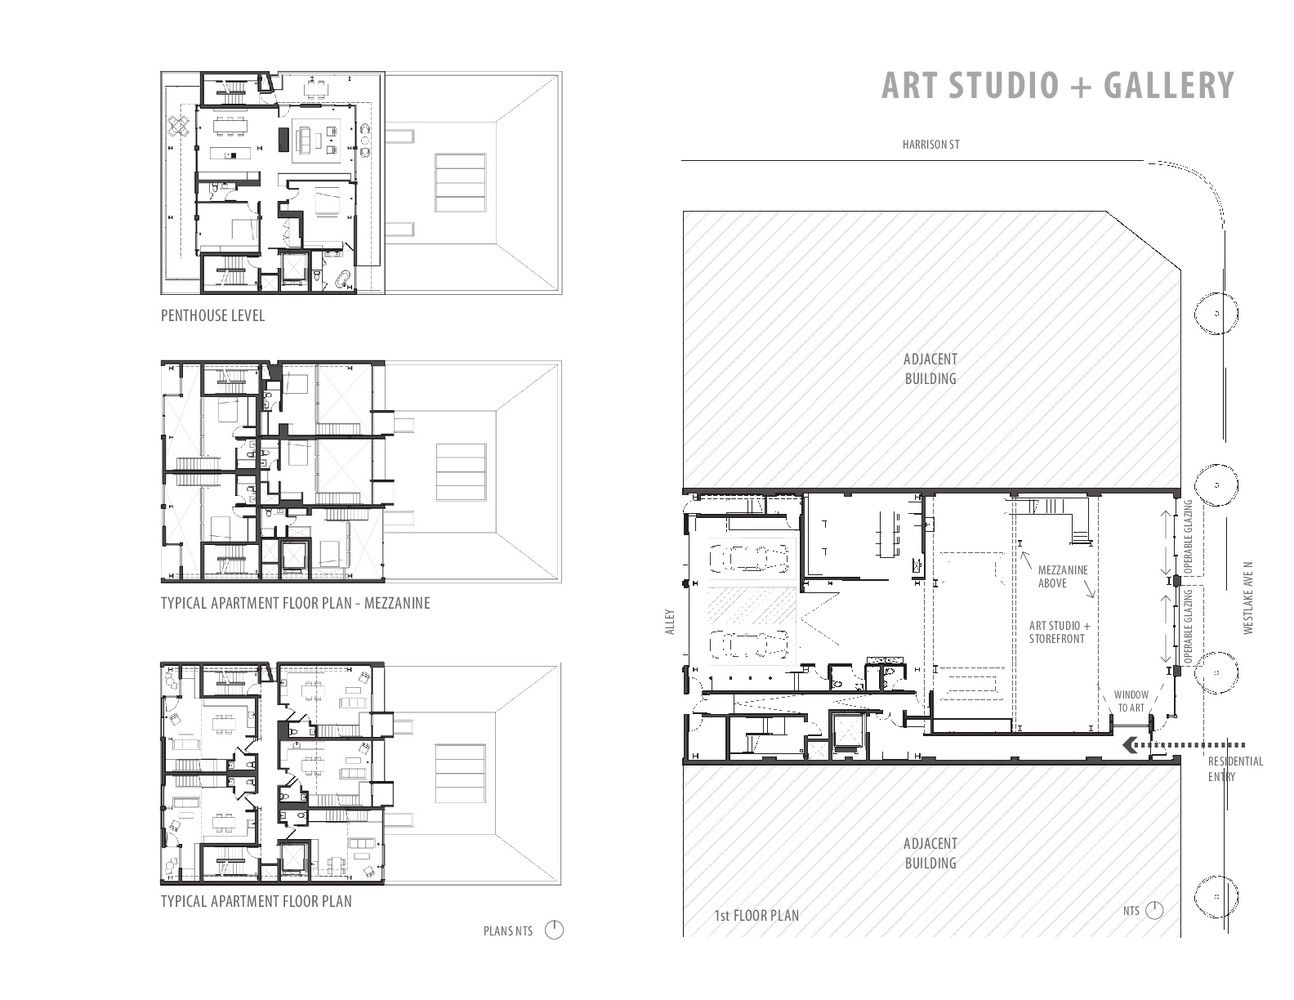 Gallery Of 325 Westlake Graham Baba Architects 27 Ground Floor Plan Architect West Lake